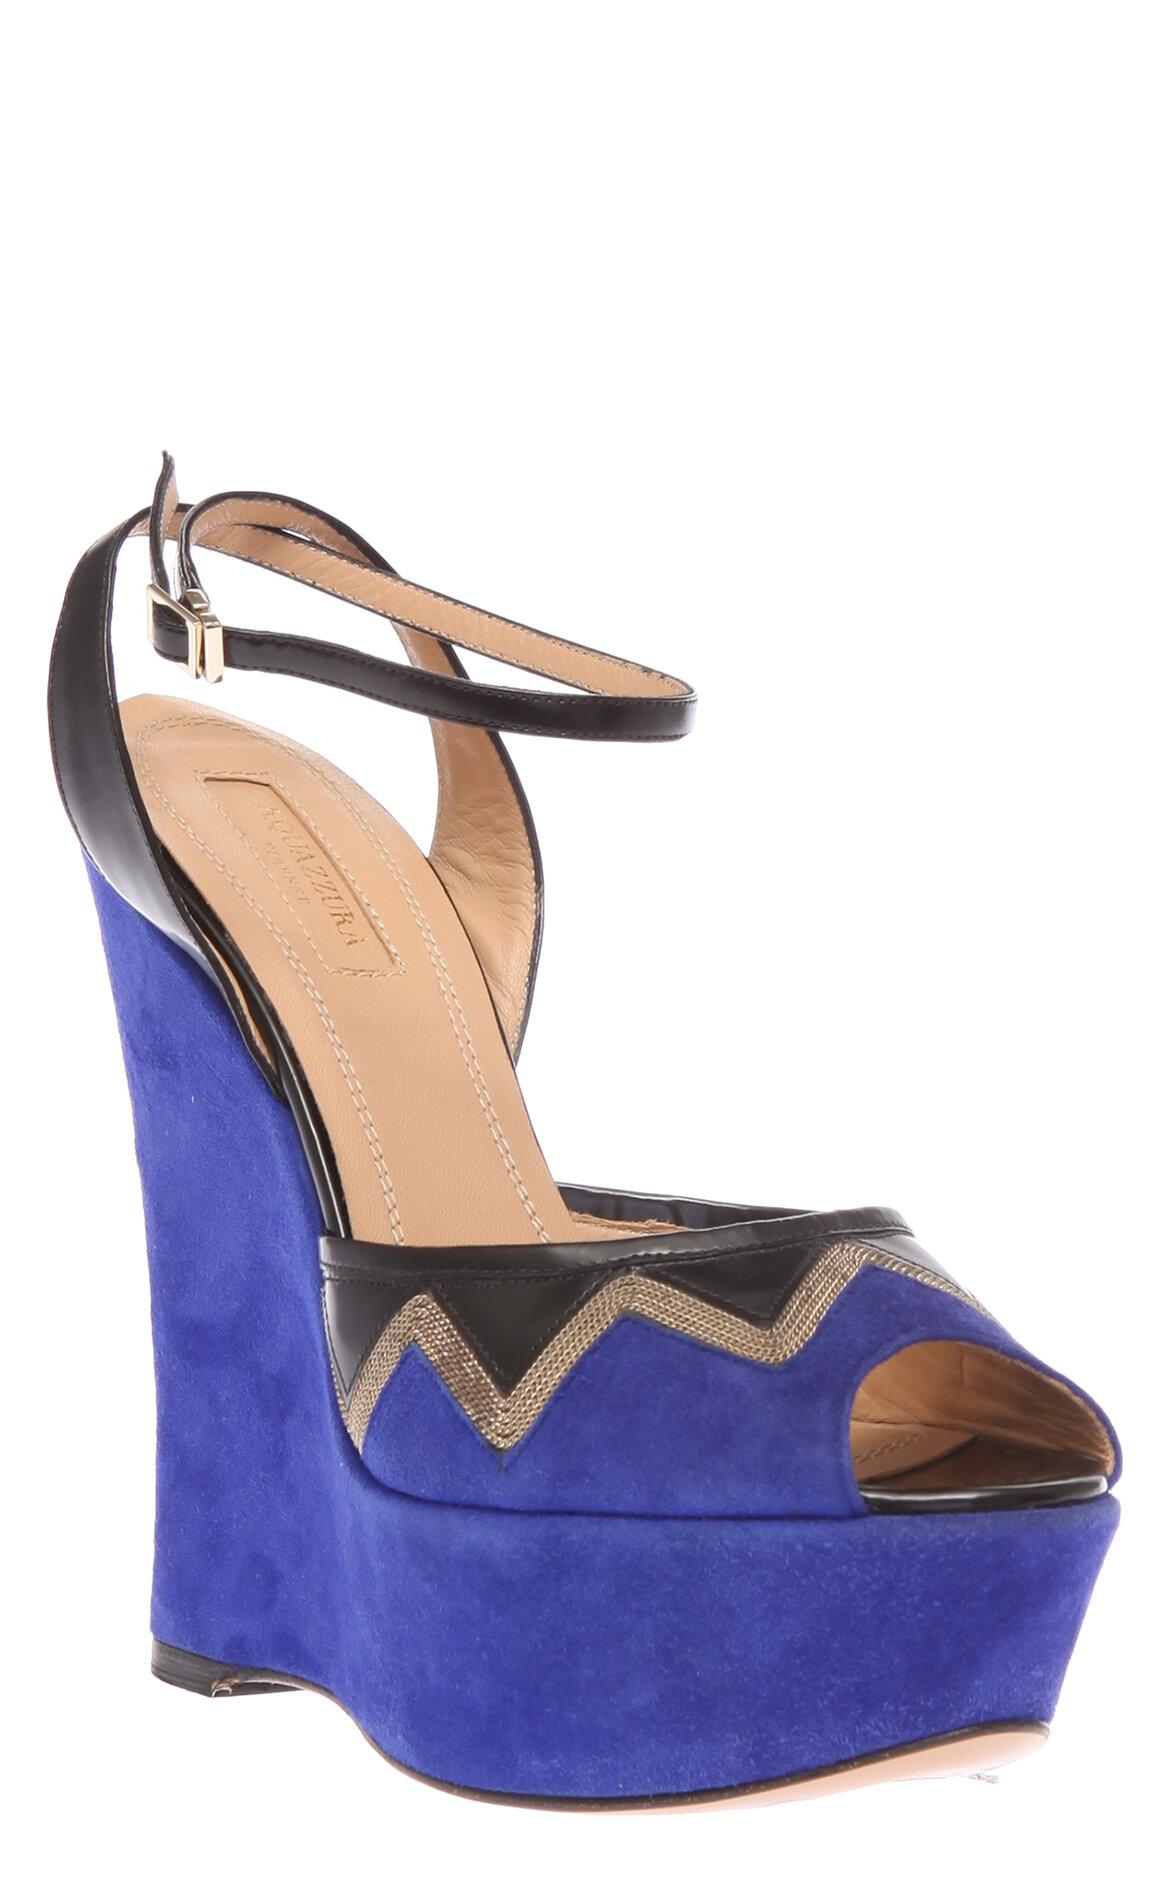 Aquazzura Ayakkabı